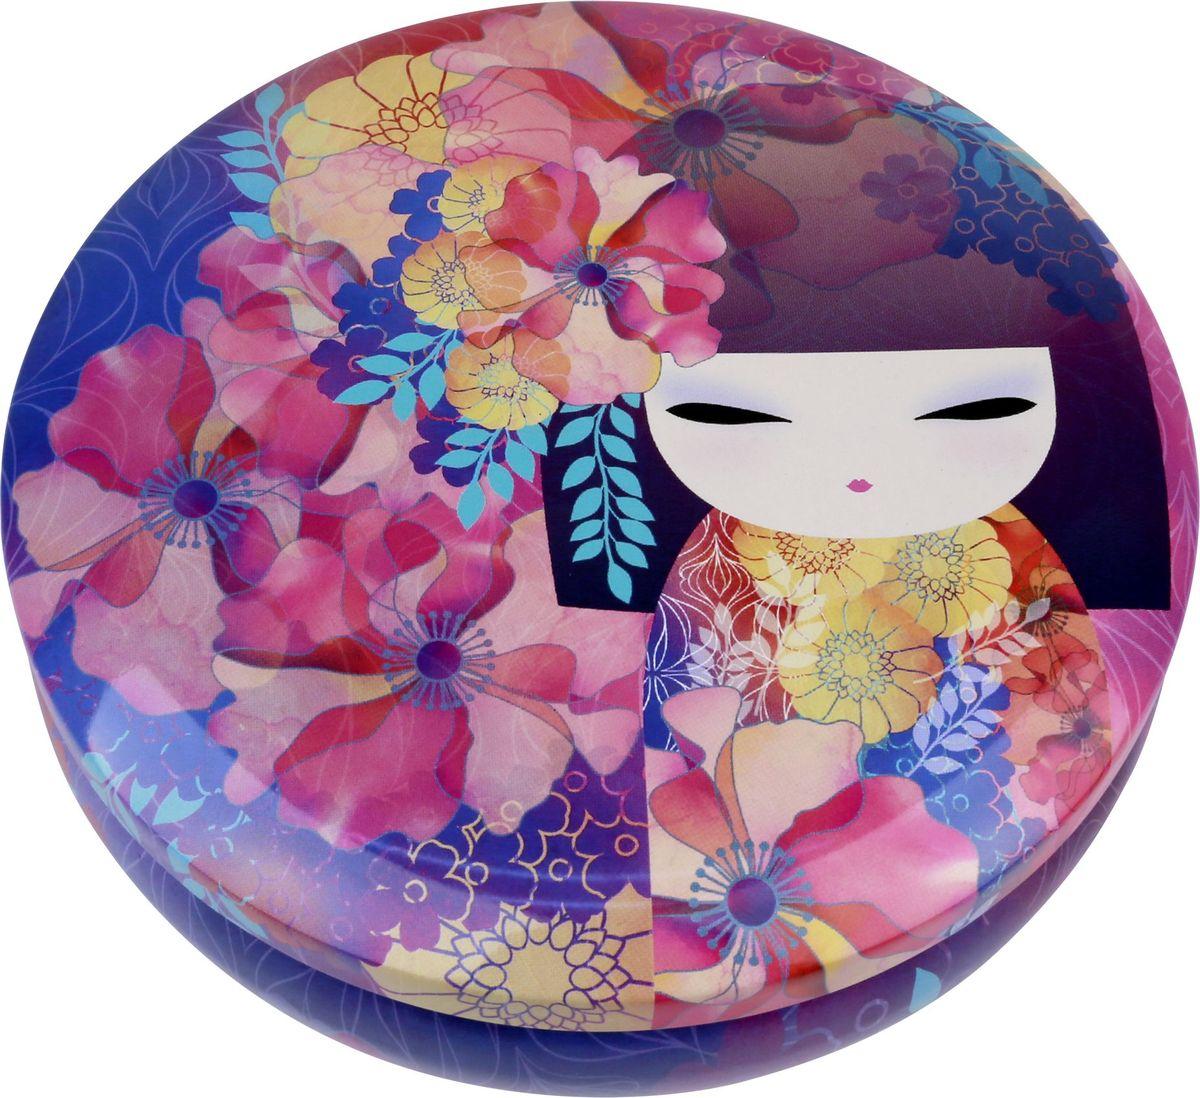 Жестяная шкатулка Kimmidoll Киока. KH098374-0060Милая жестяная шкатулка для хранения бижутерии или косметики.Материал: жестьРазмер: 13,5 x 4,5 x 13,5 см.